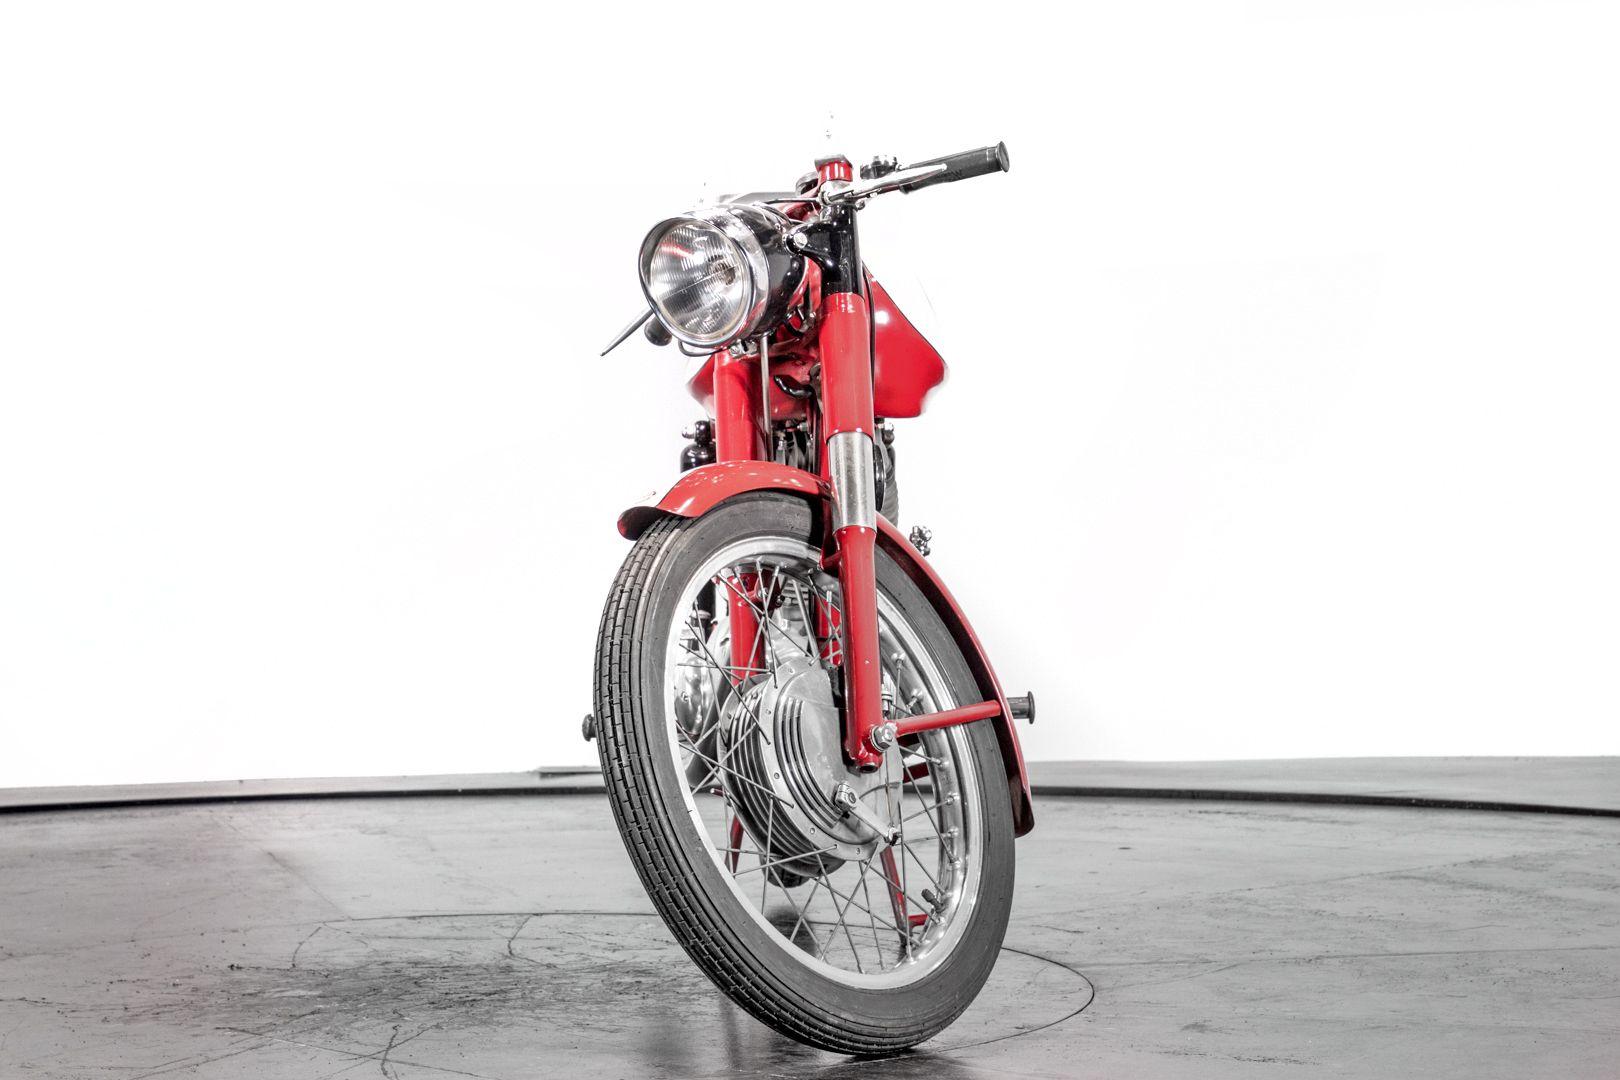 1957 Moto Morini 175 71729